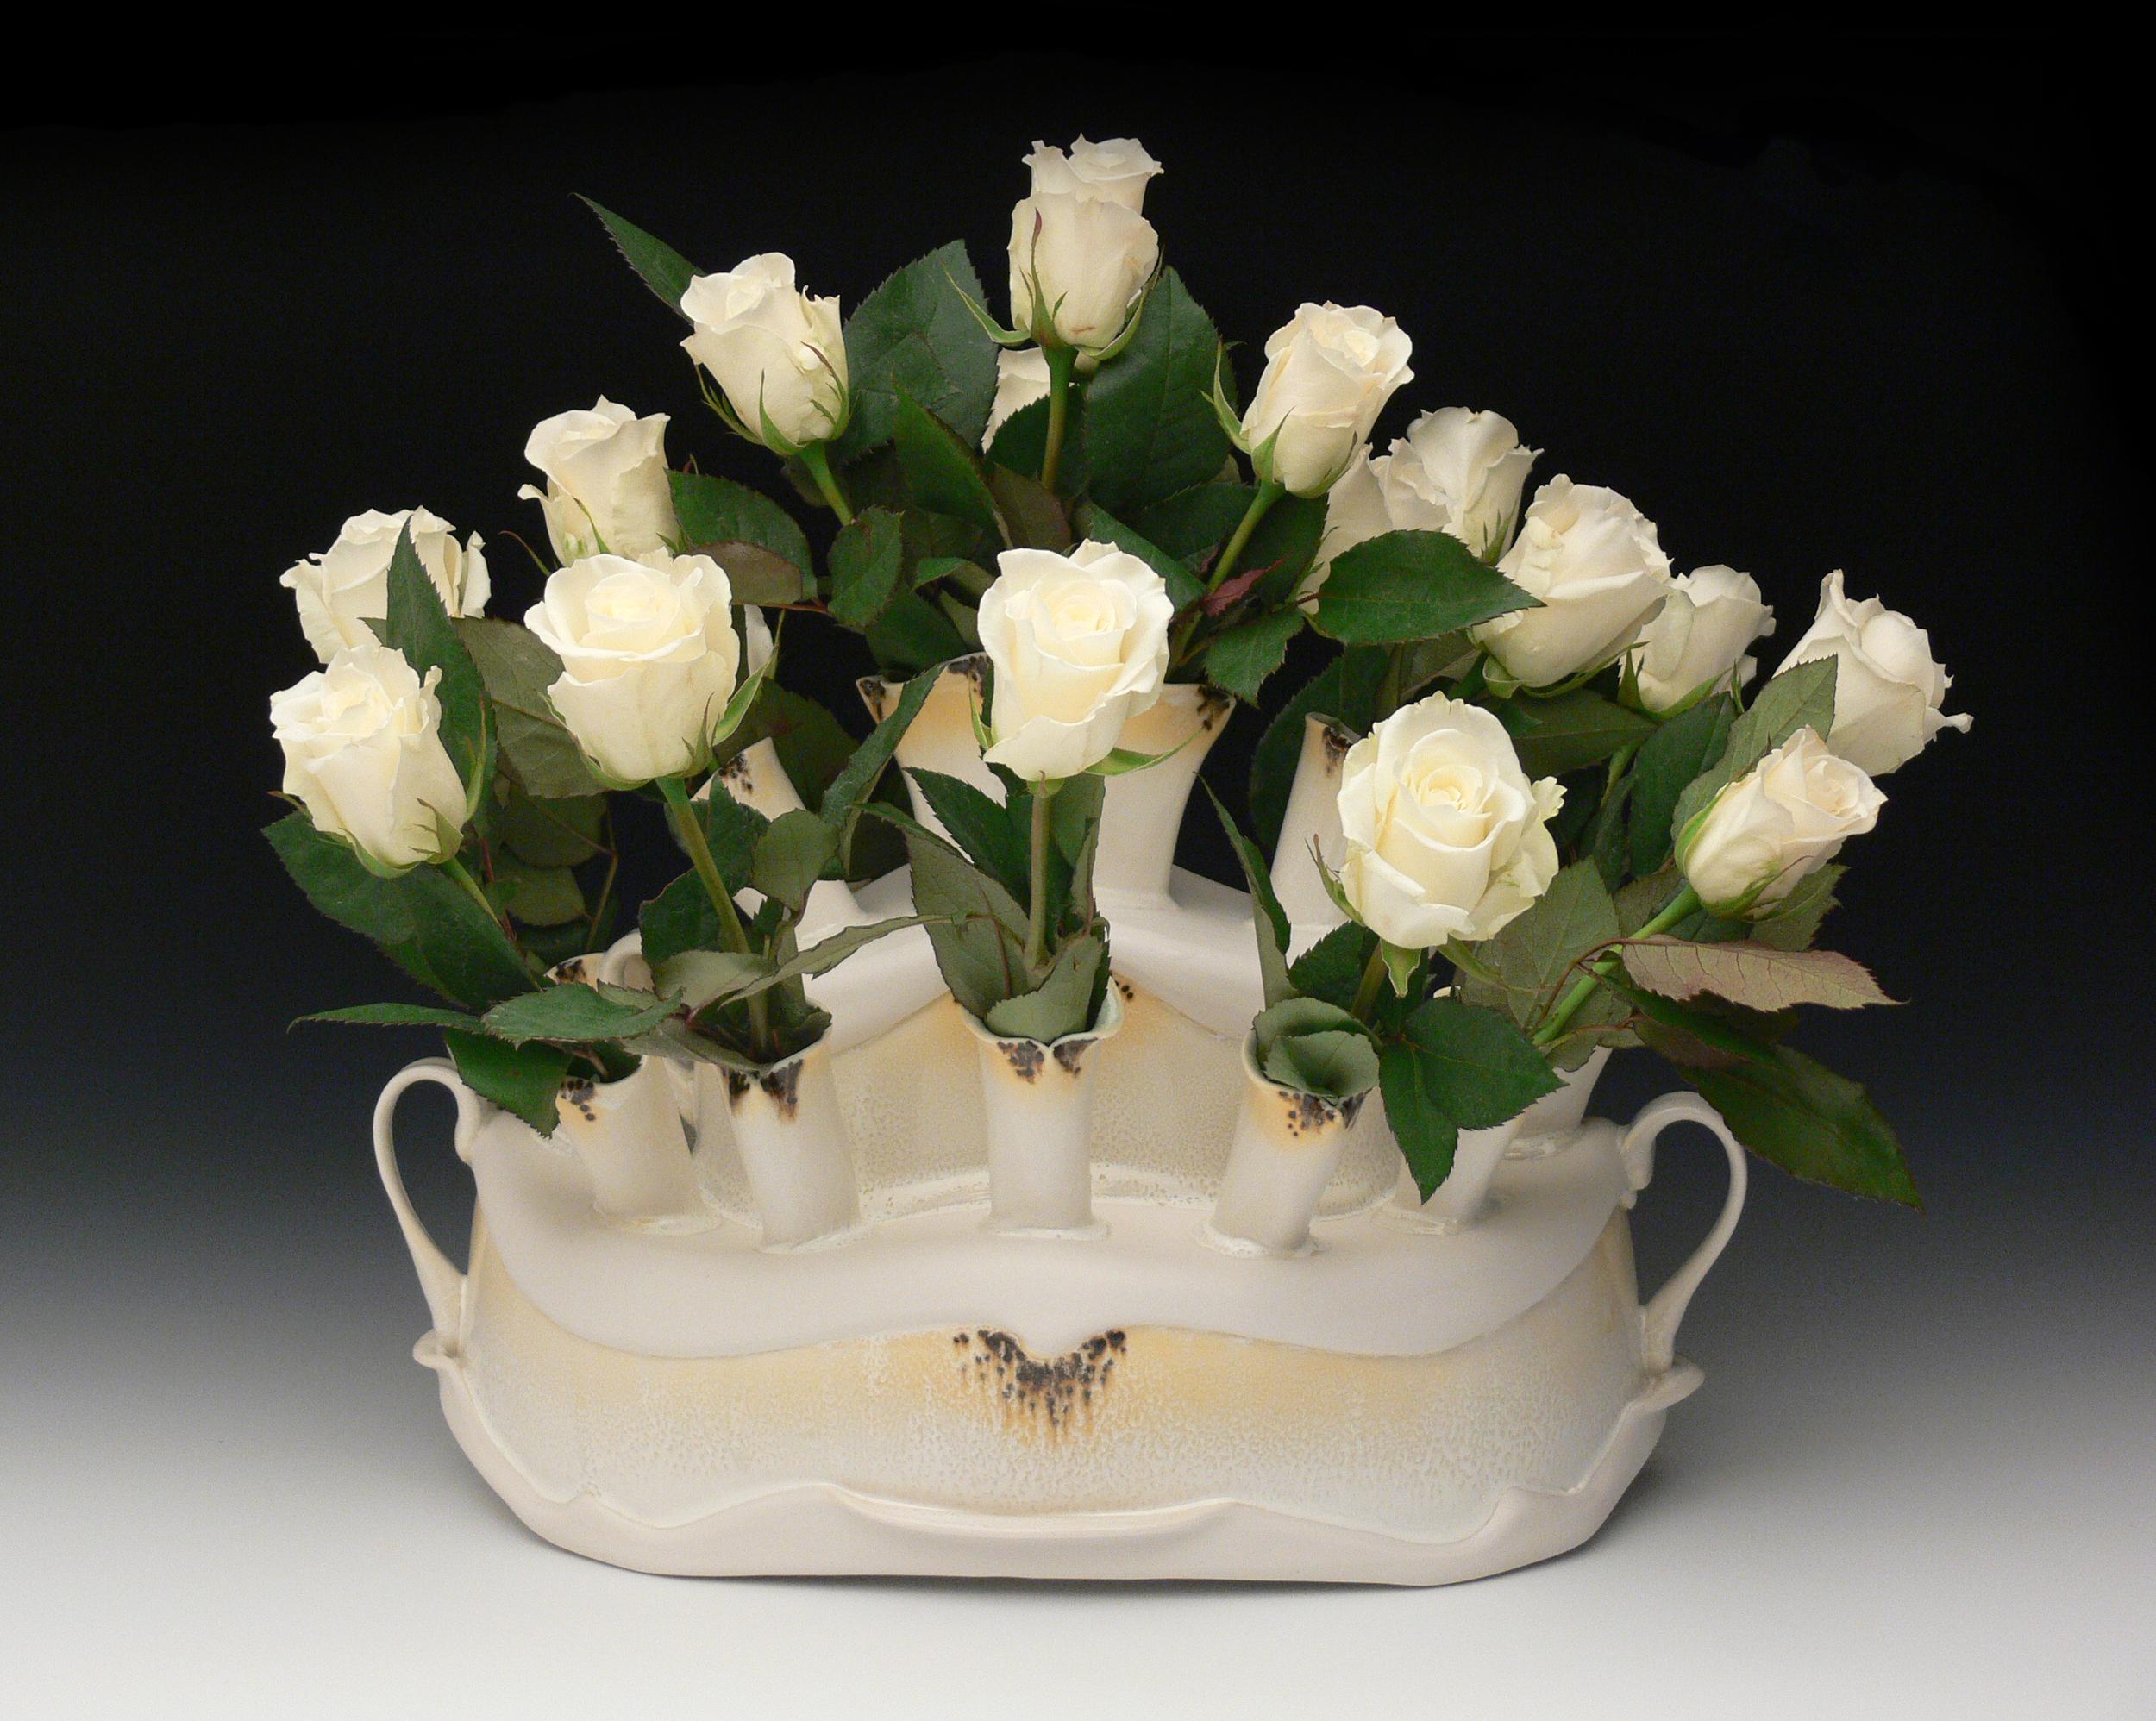 FlowerBrick with Flowers.JPG